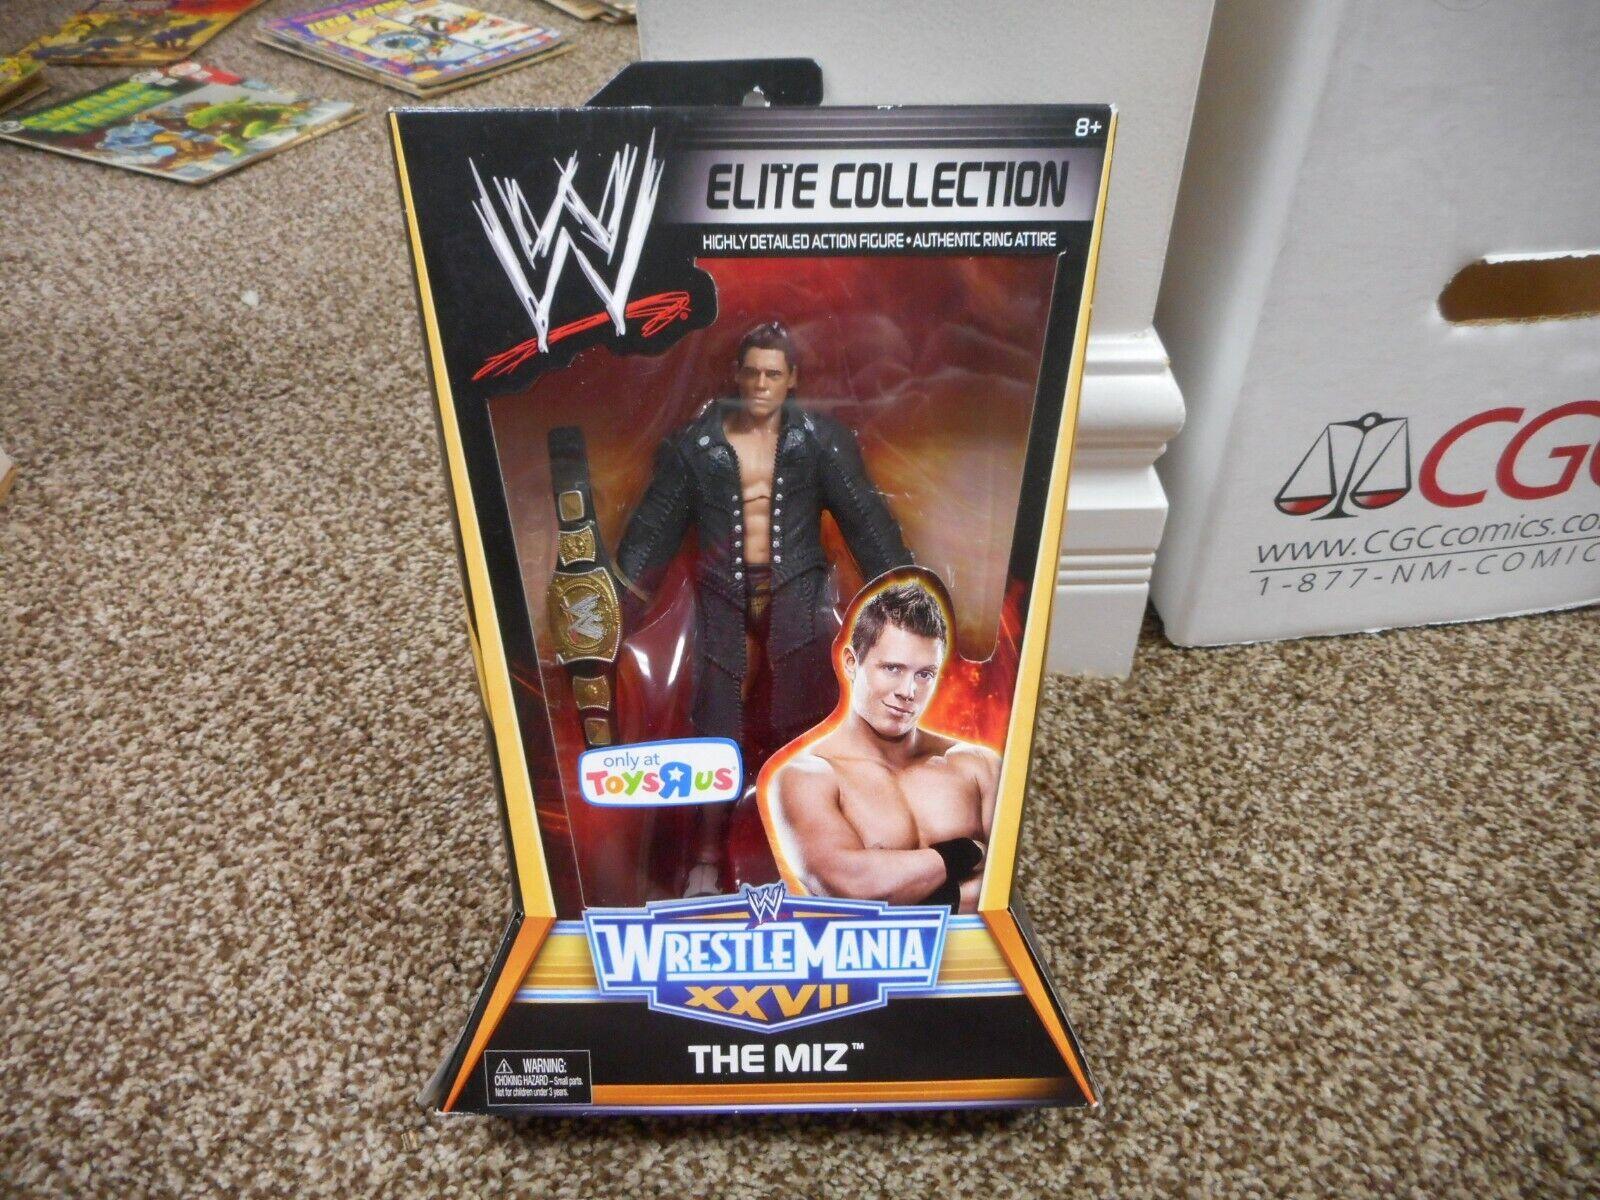 The Miz WWE Elite MIB MIB MIB SEALED scatola MOC Wrestleuomoia XXVII 27 giocattoli R Us Mattel TRU ed33b4